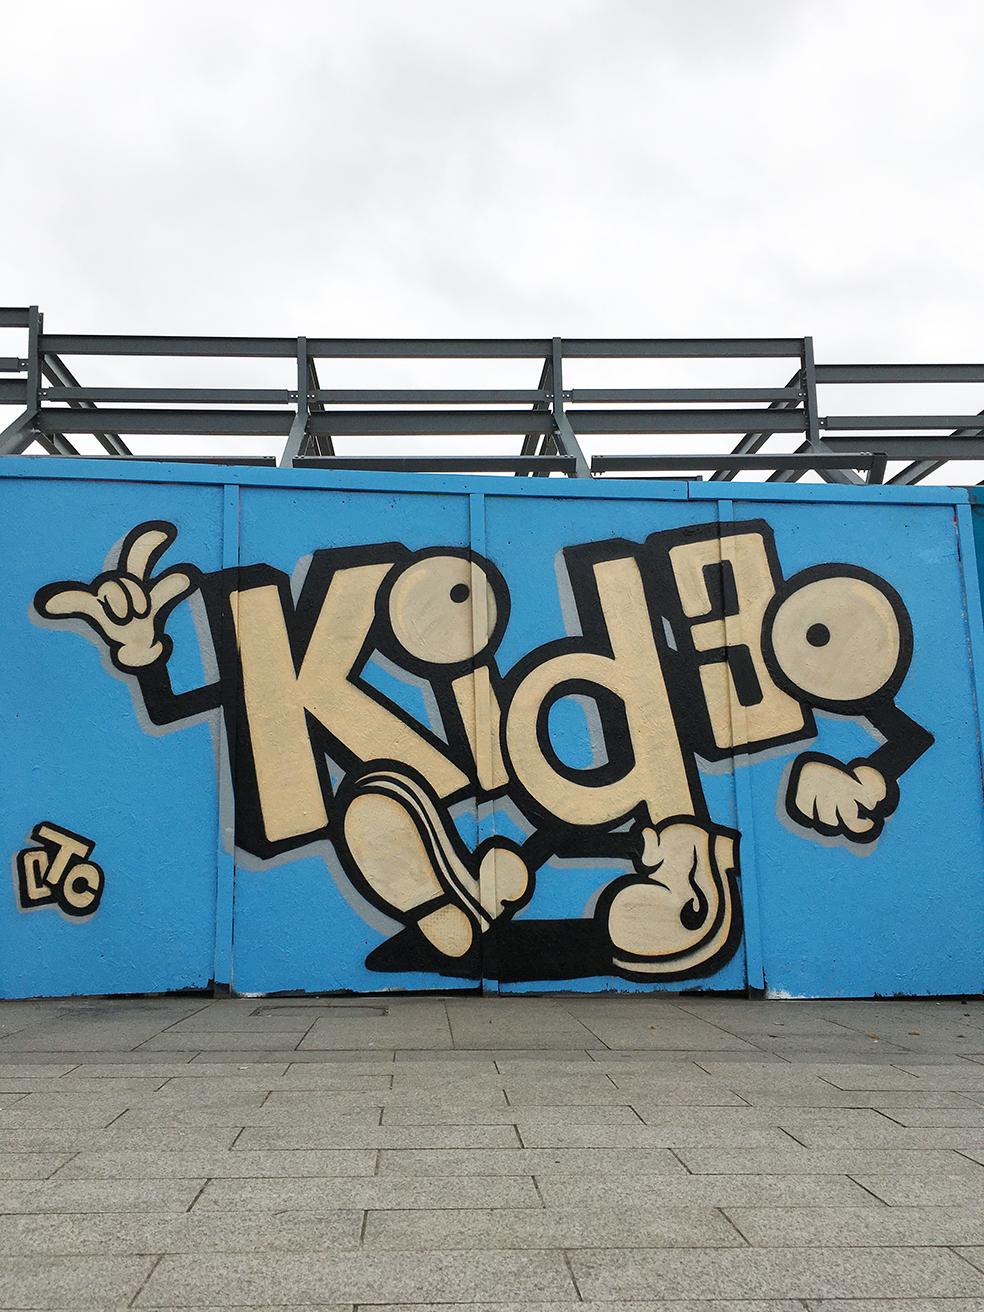 kid30 graffiti street art nottingham sneinton market creative quauter